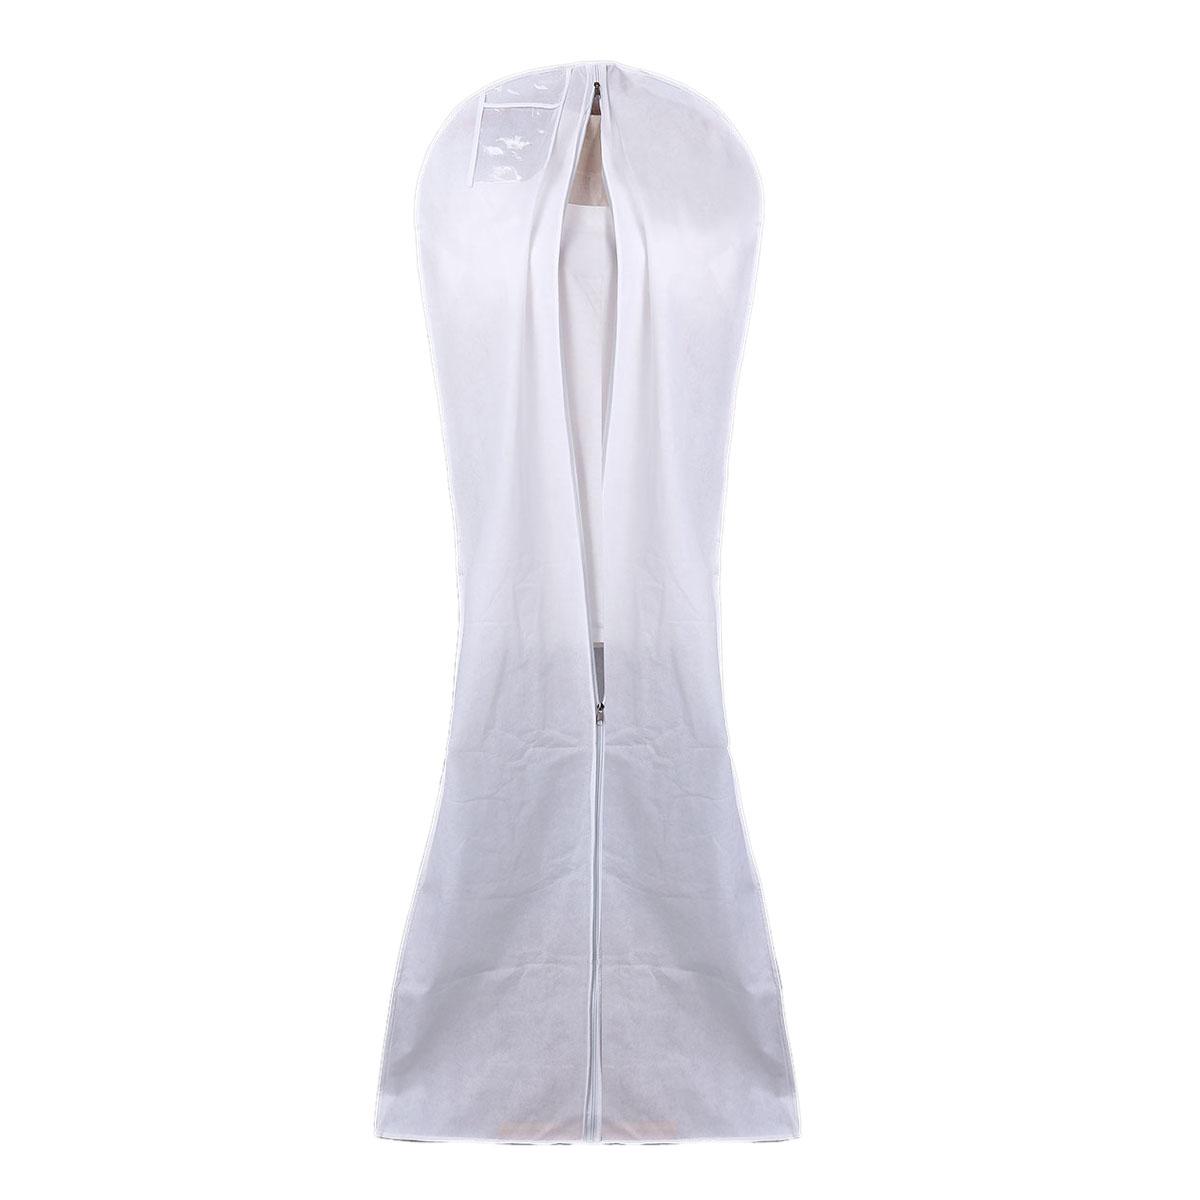 Wedding dress bridal gown garment cover storage bag carry for Storing wedding dress in garment bag